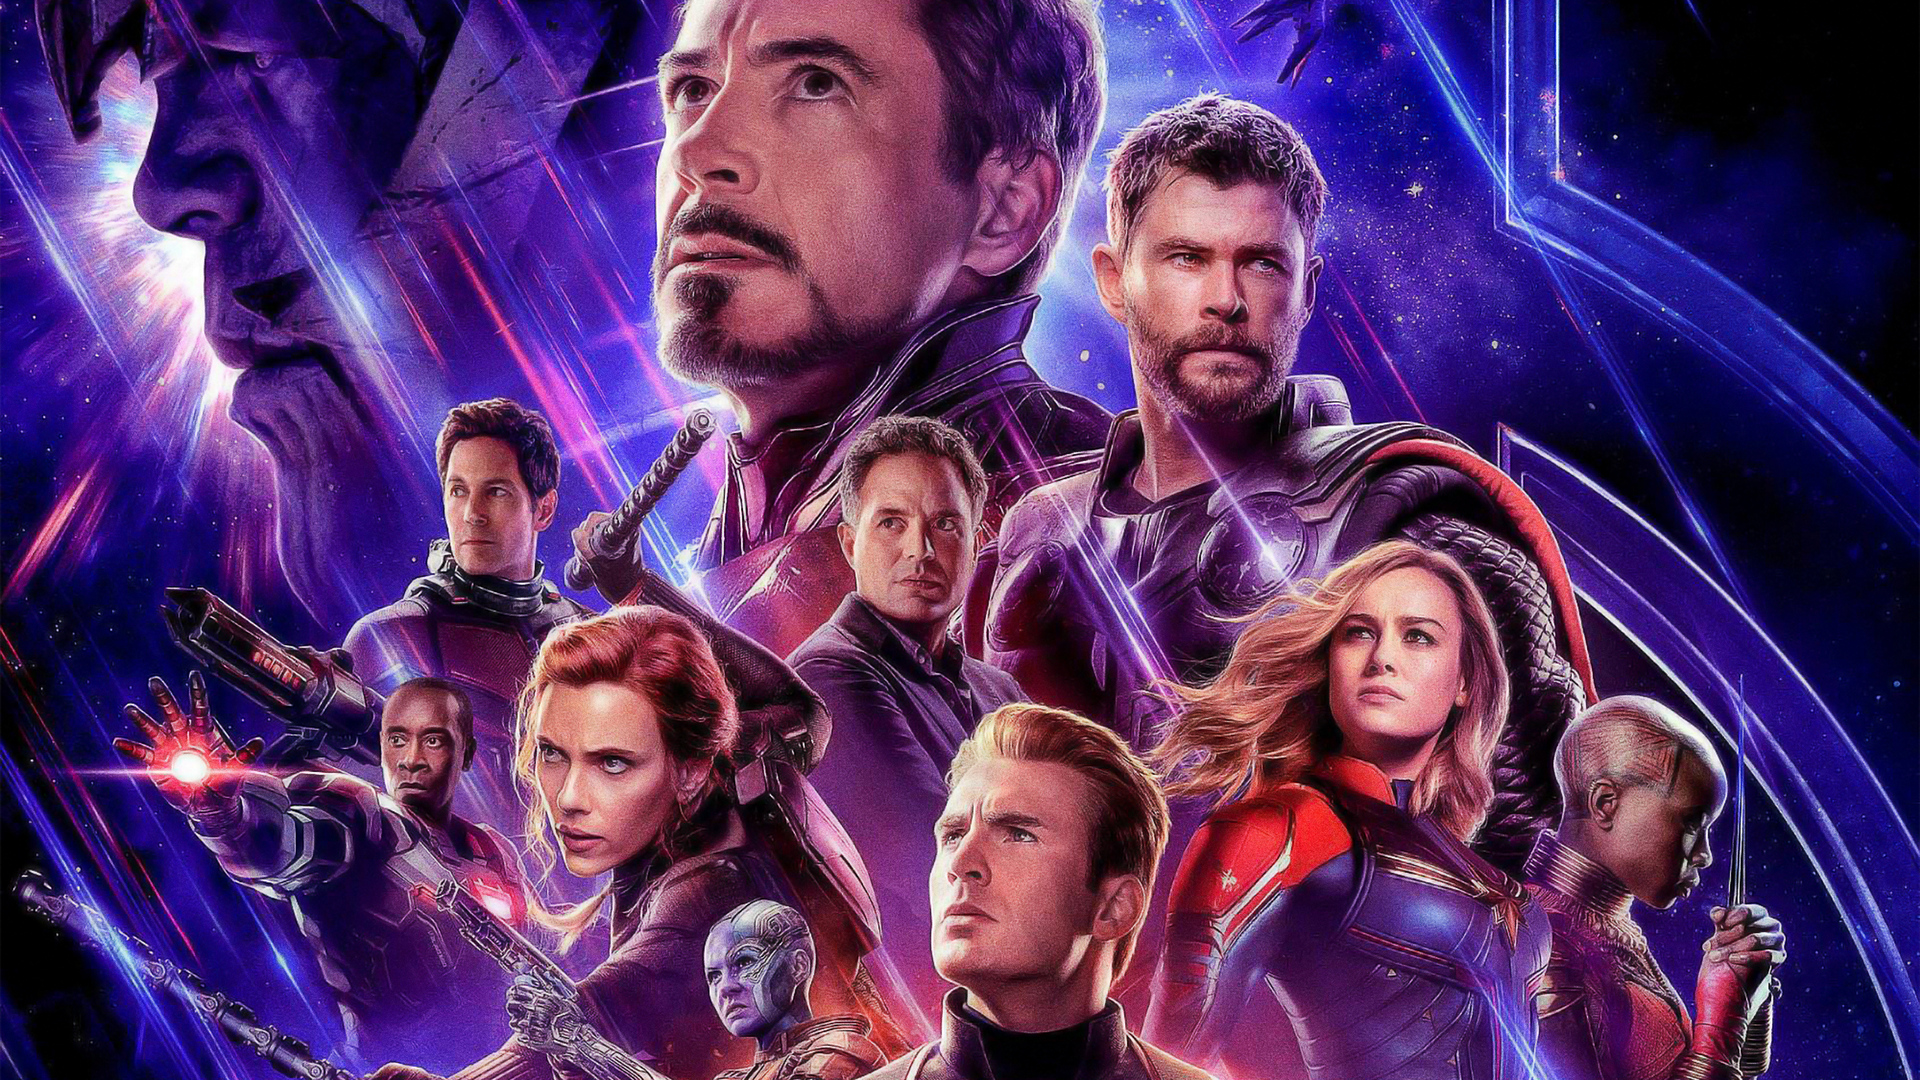 Avengers Endgame Official Wallpaper Hd Favourites Game Wallpaper